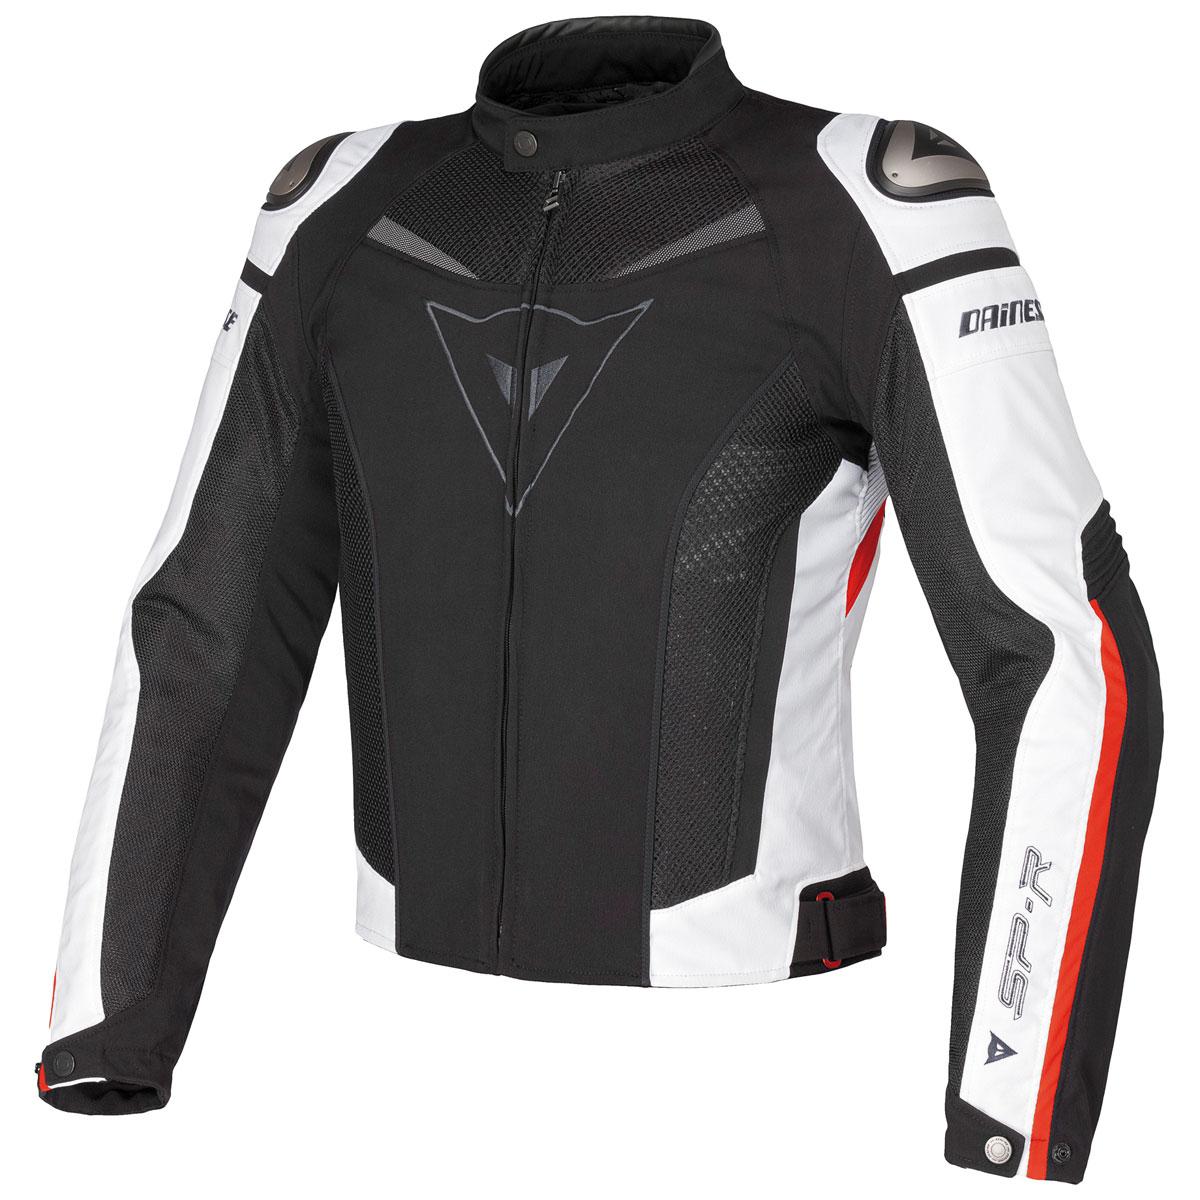 Dainese Men's Super Speed Black/White/Red Textile Jacket